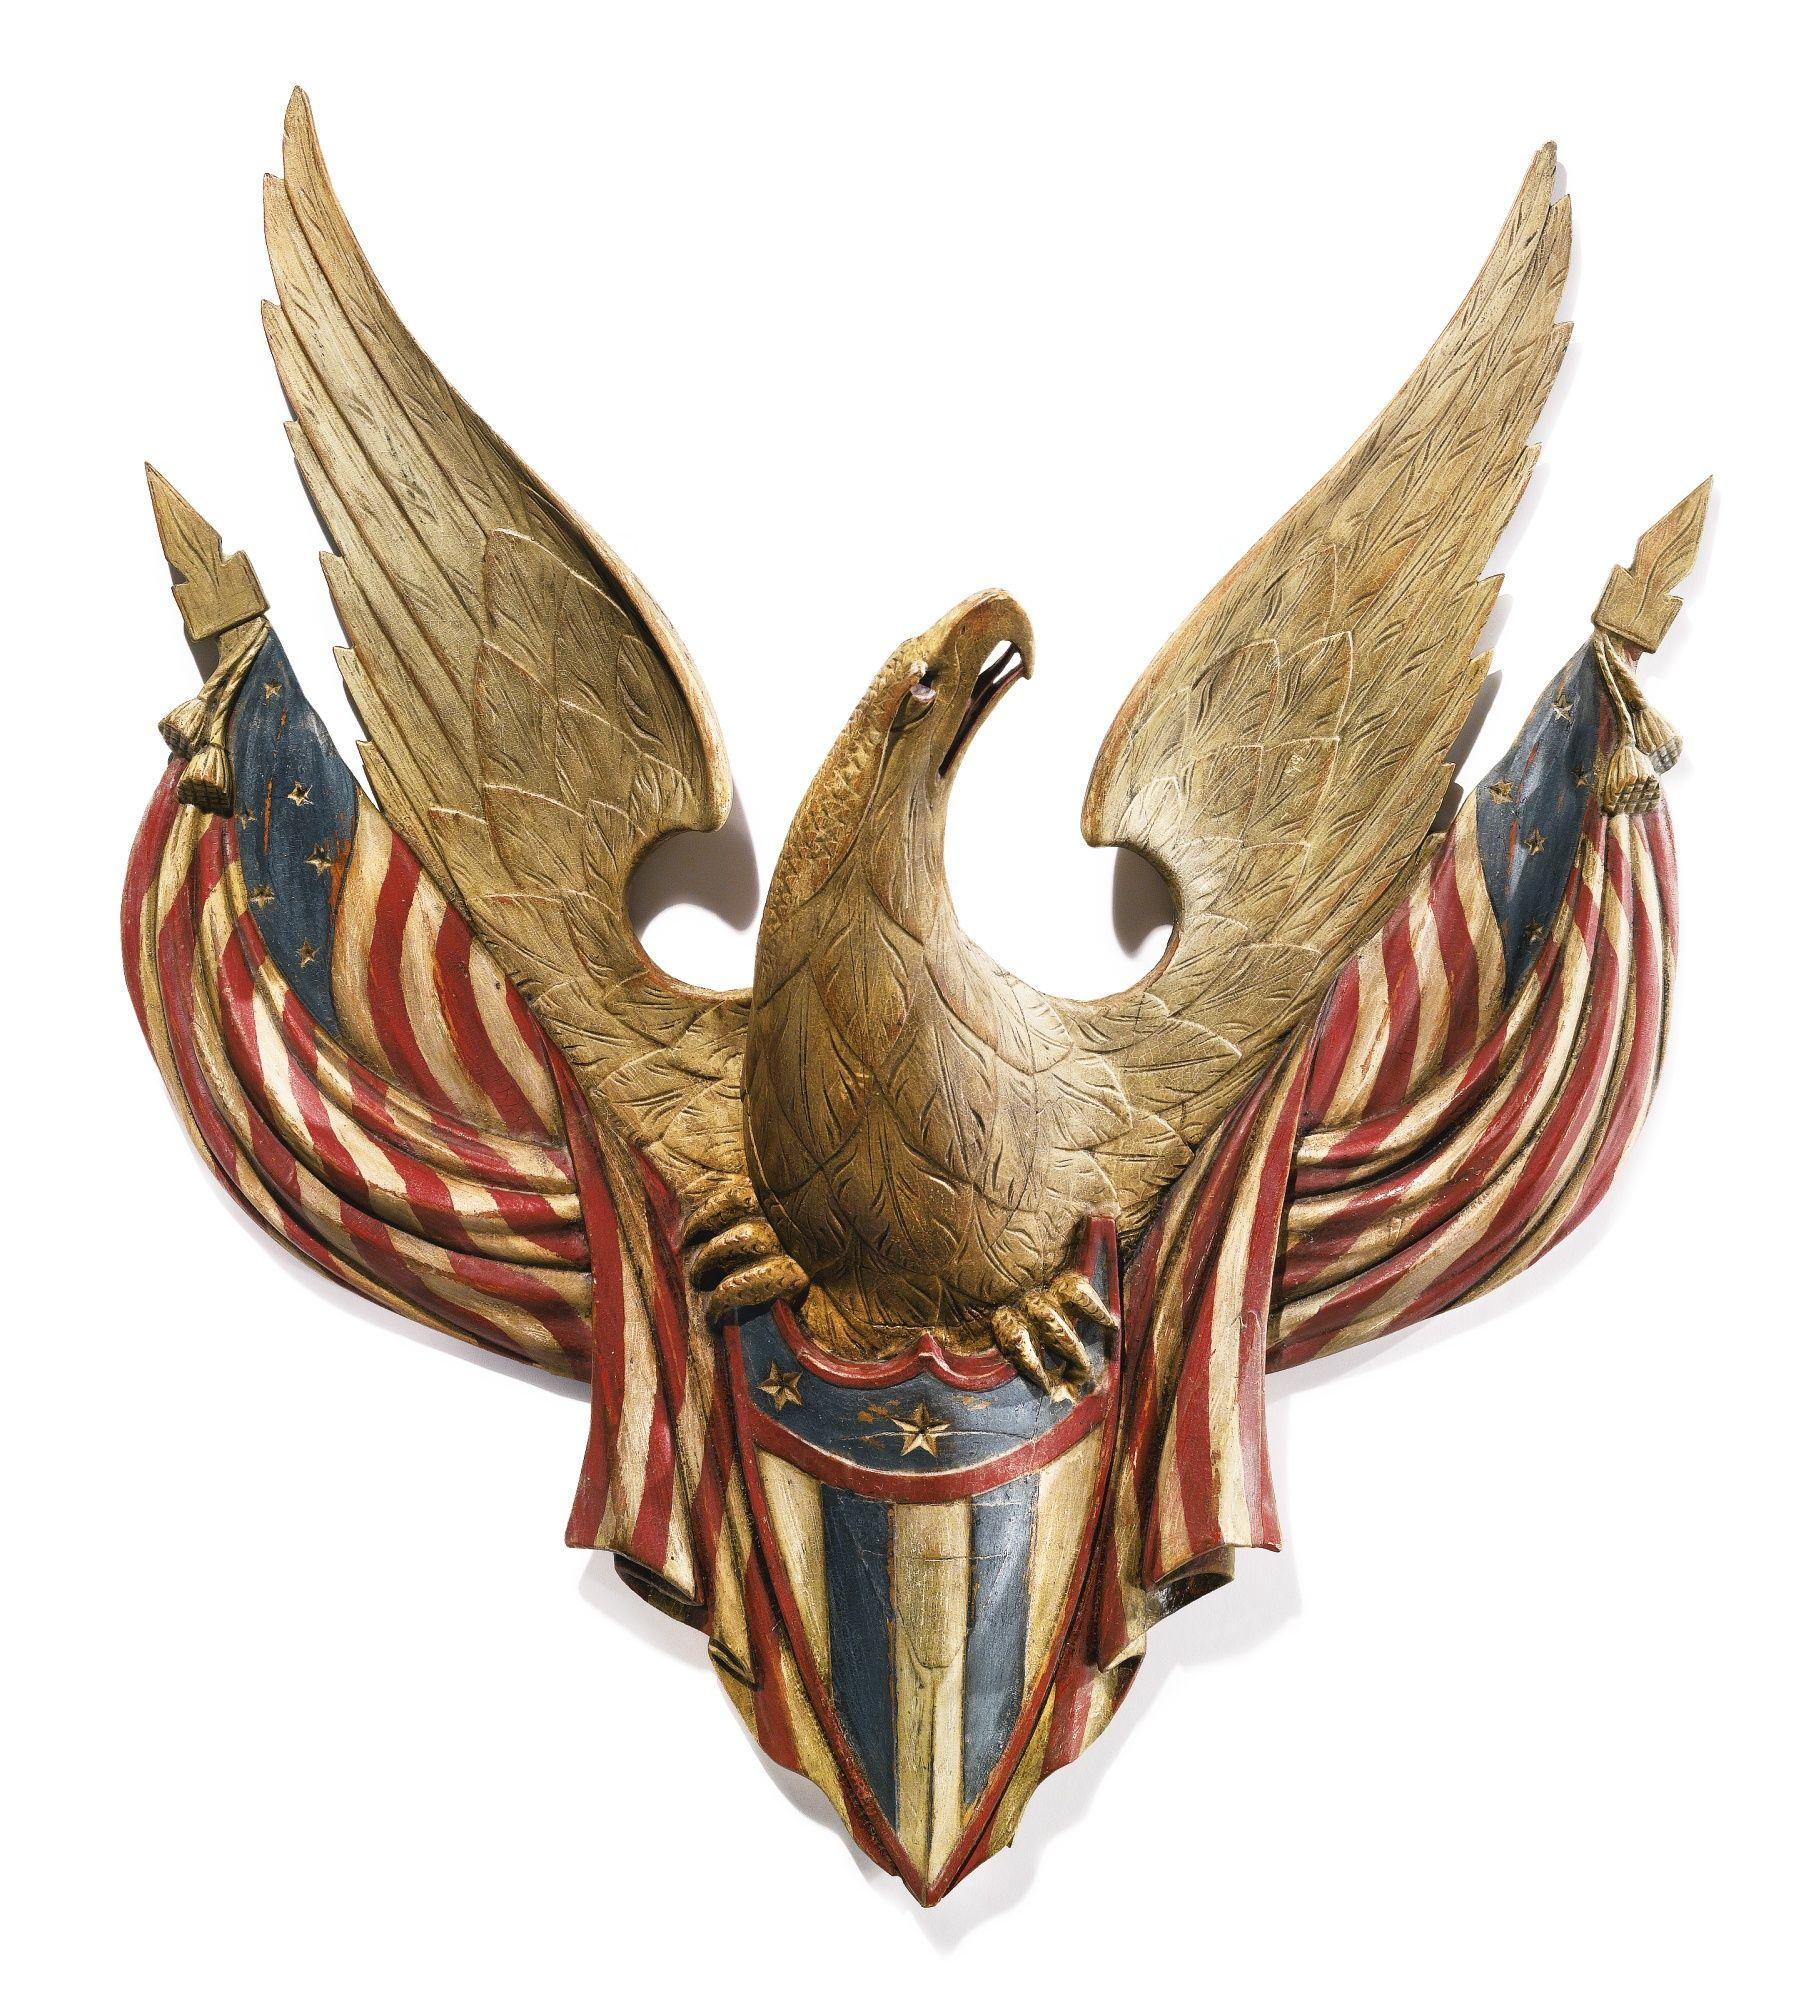 Huge old hand carved wood federal eagle folk art wooden eagle wall - American Eagle Sotheby S Auction Jan 23 2016 By John Haley Bellamy Estimate 250 000 Art Carvedamerican Artistsbird Artart Sculpturespetra Folk